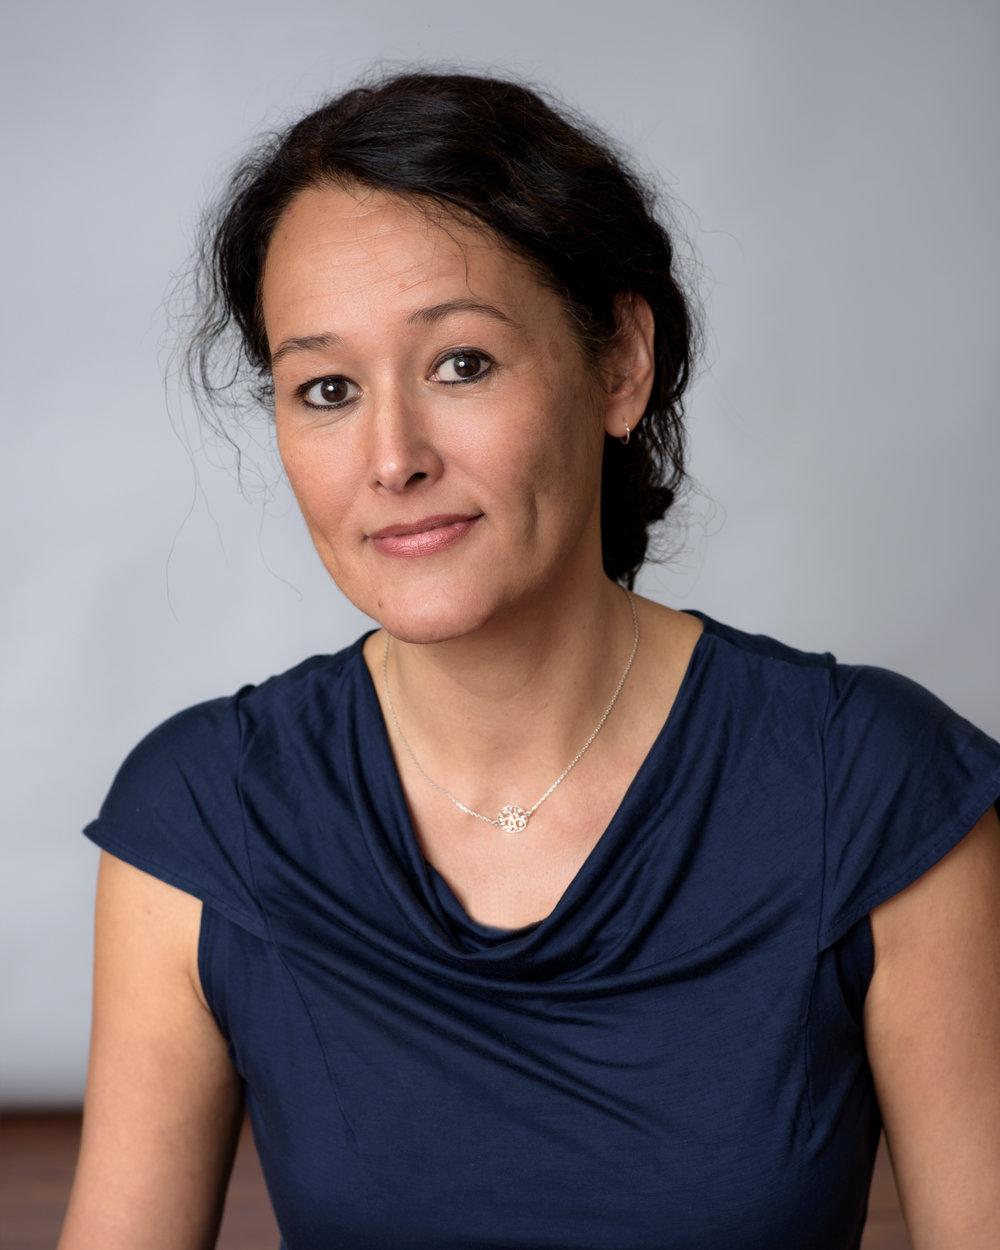 Myrte IJkelenstam, Shiatsu therapist